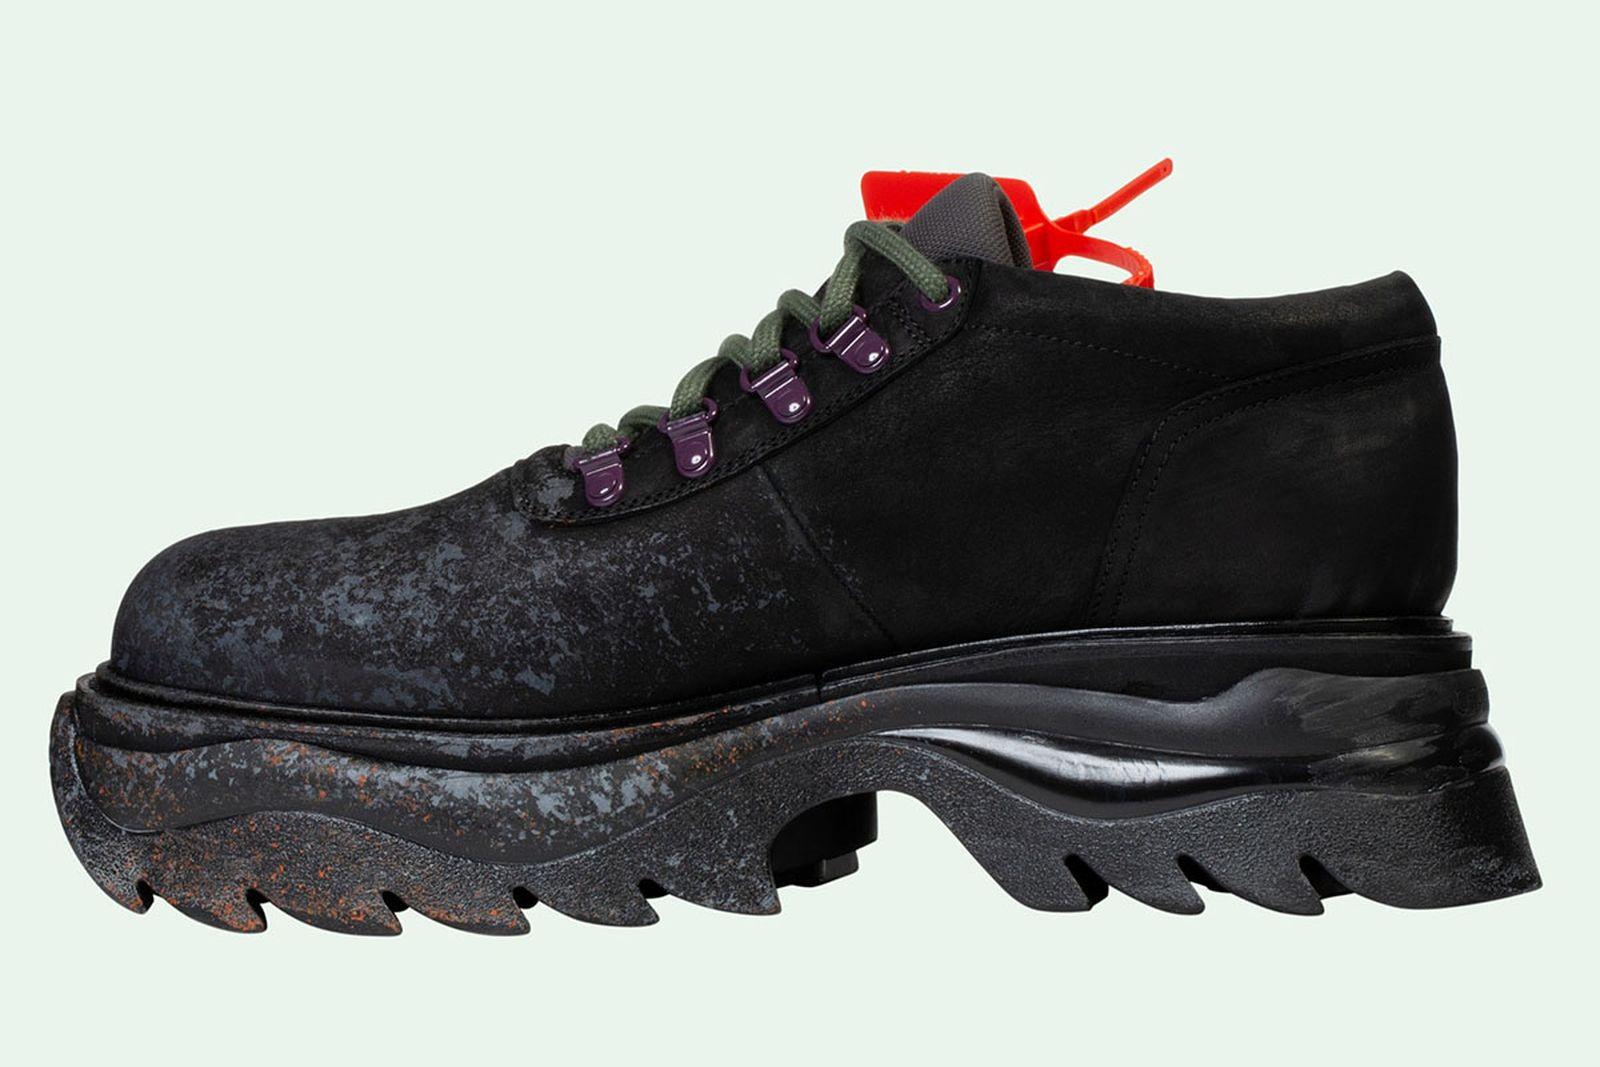 off-white-ridged-sole-sneaker-release-date-price-03